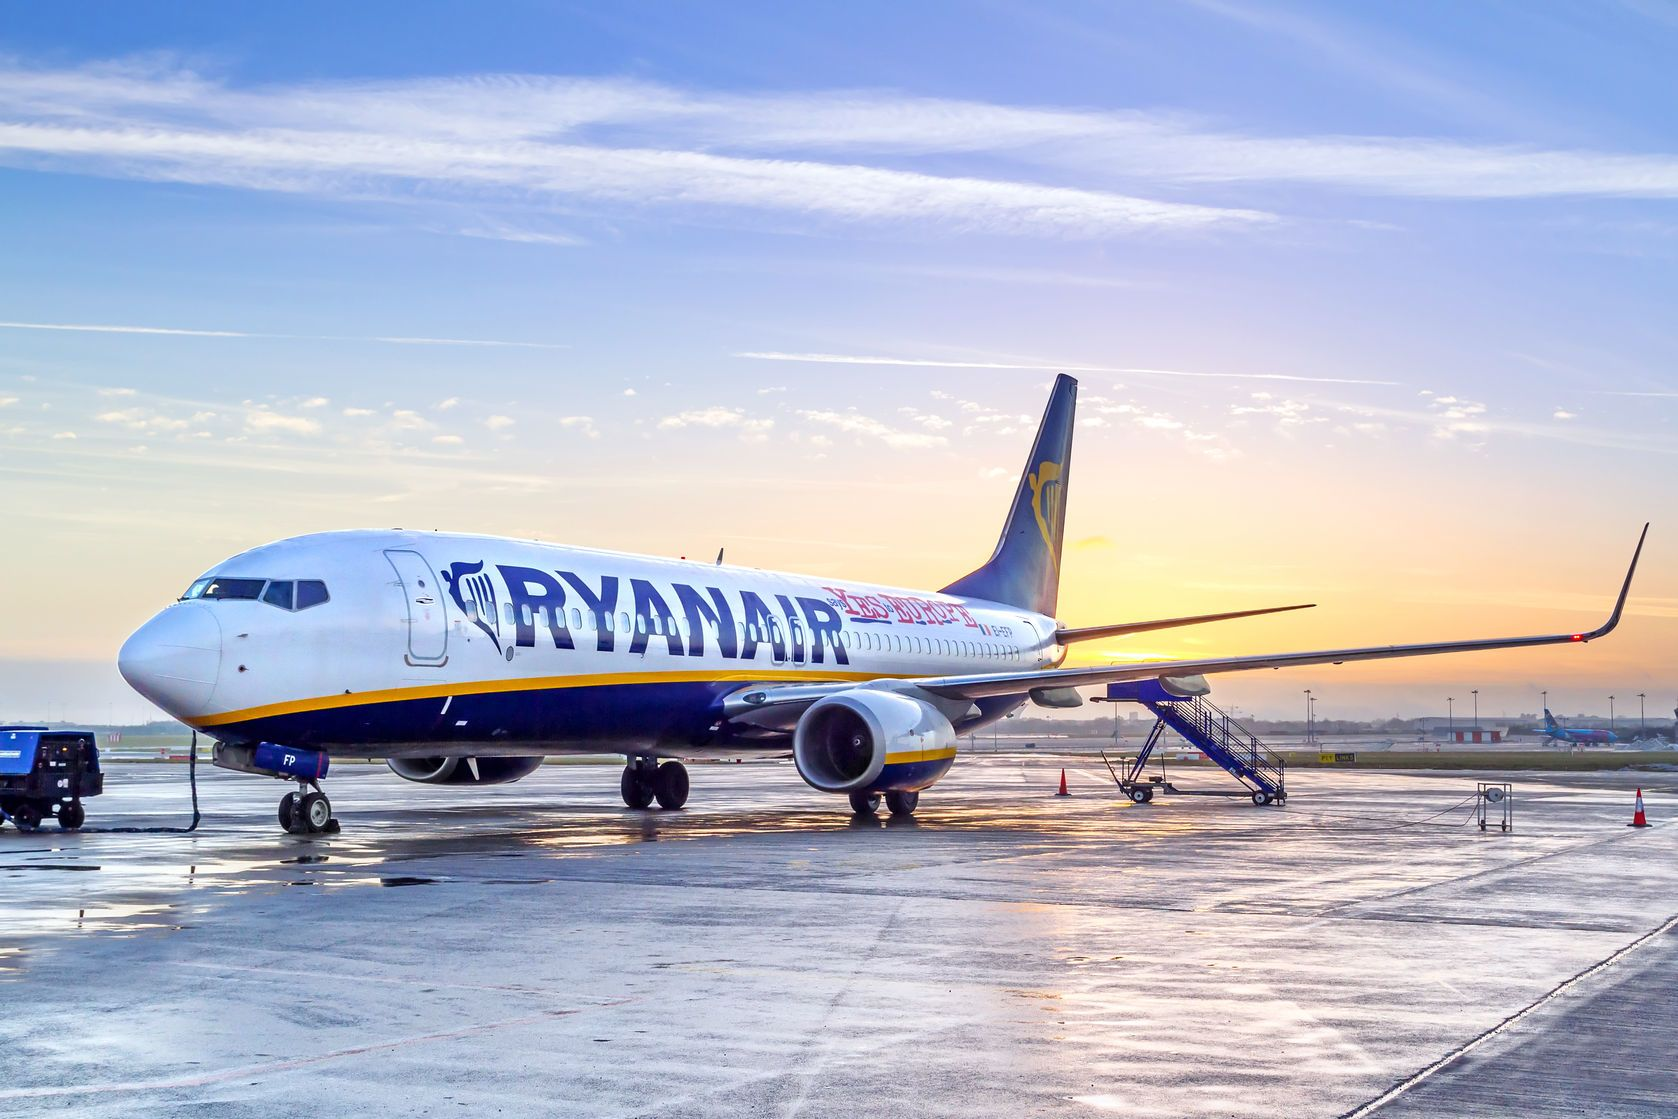 Letadlo společnosti Ryanair | patrykkosmider/123RF.com